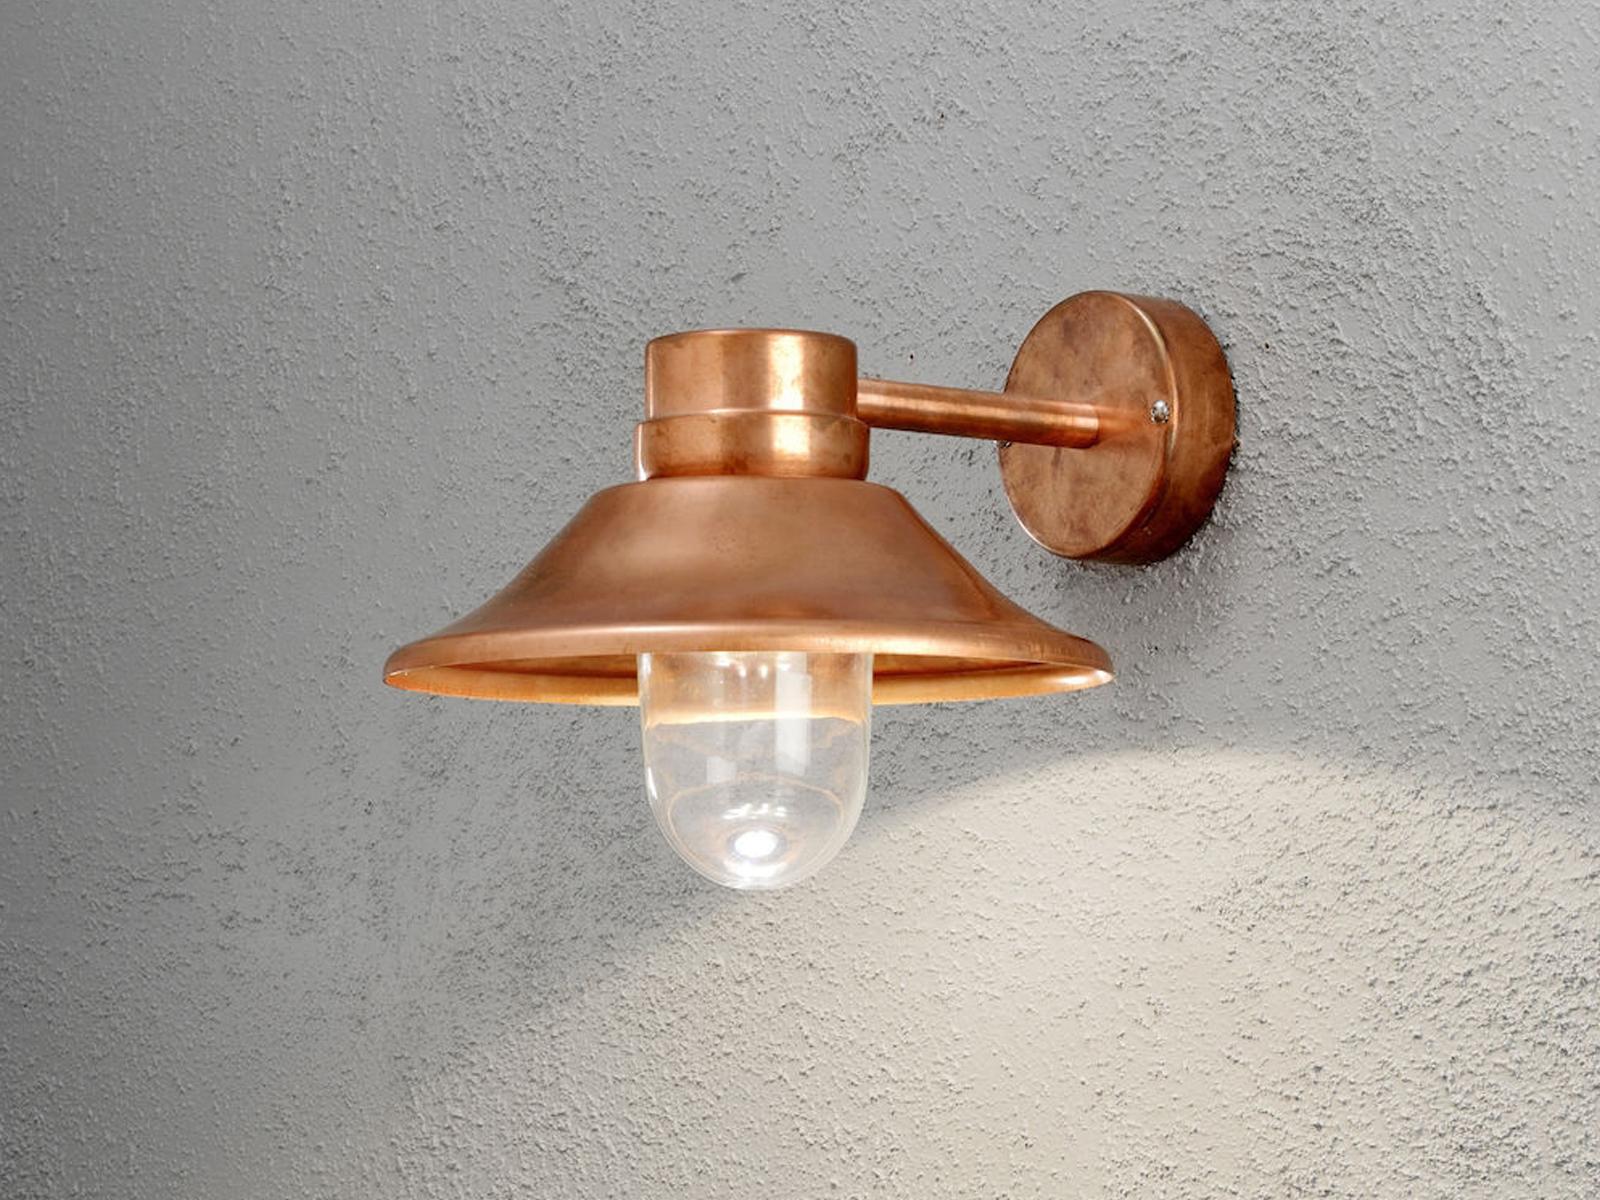 LED LED LED Außenwandleuchte Wandleuchte VEGA massives Kupfer dimmbar 700 Lm 3490b3